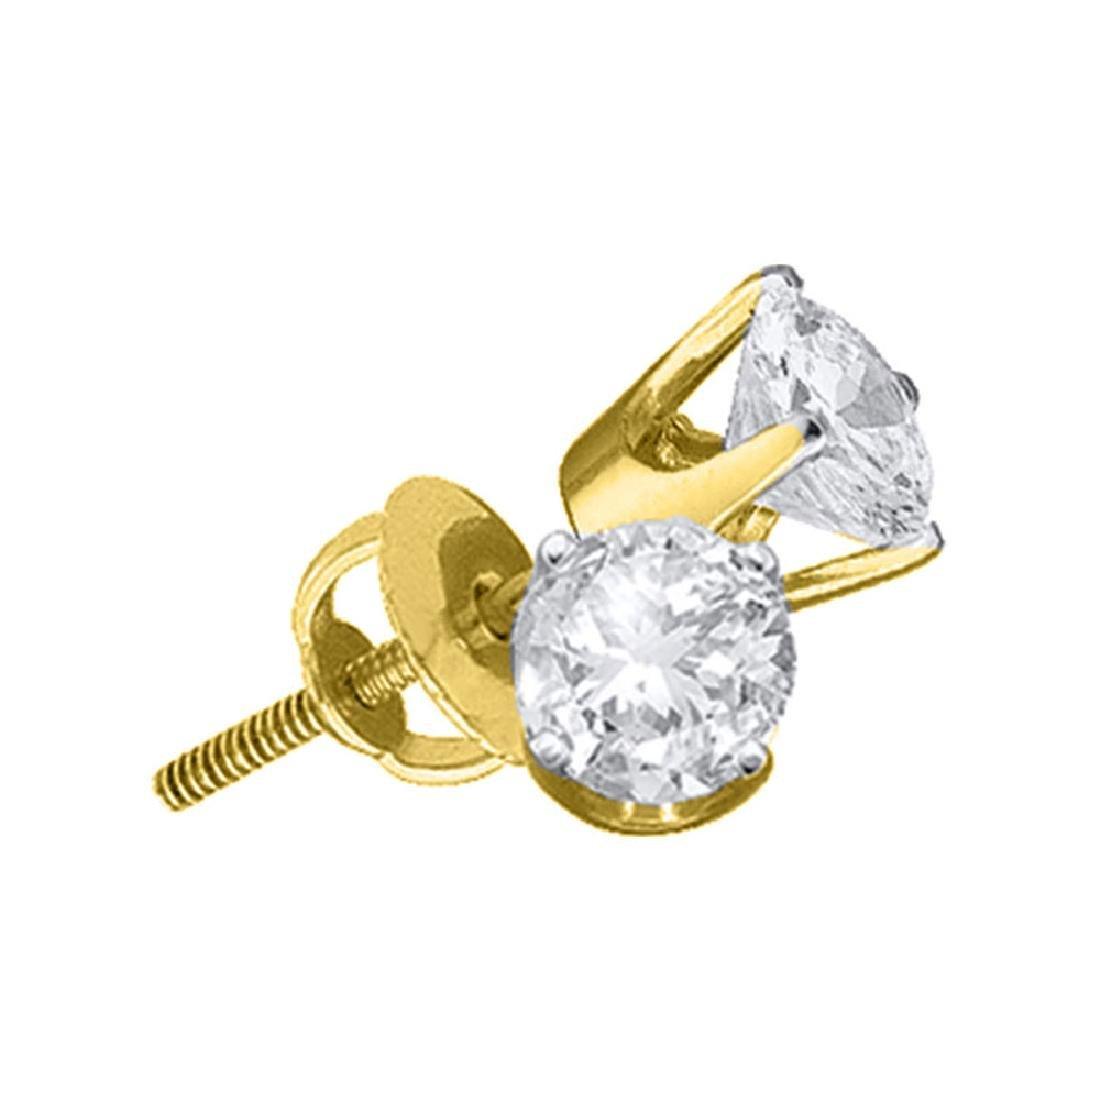 1.5 CTW Diamond Solitaire Stud Earrings 14KT Yellow